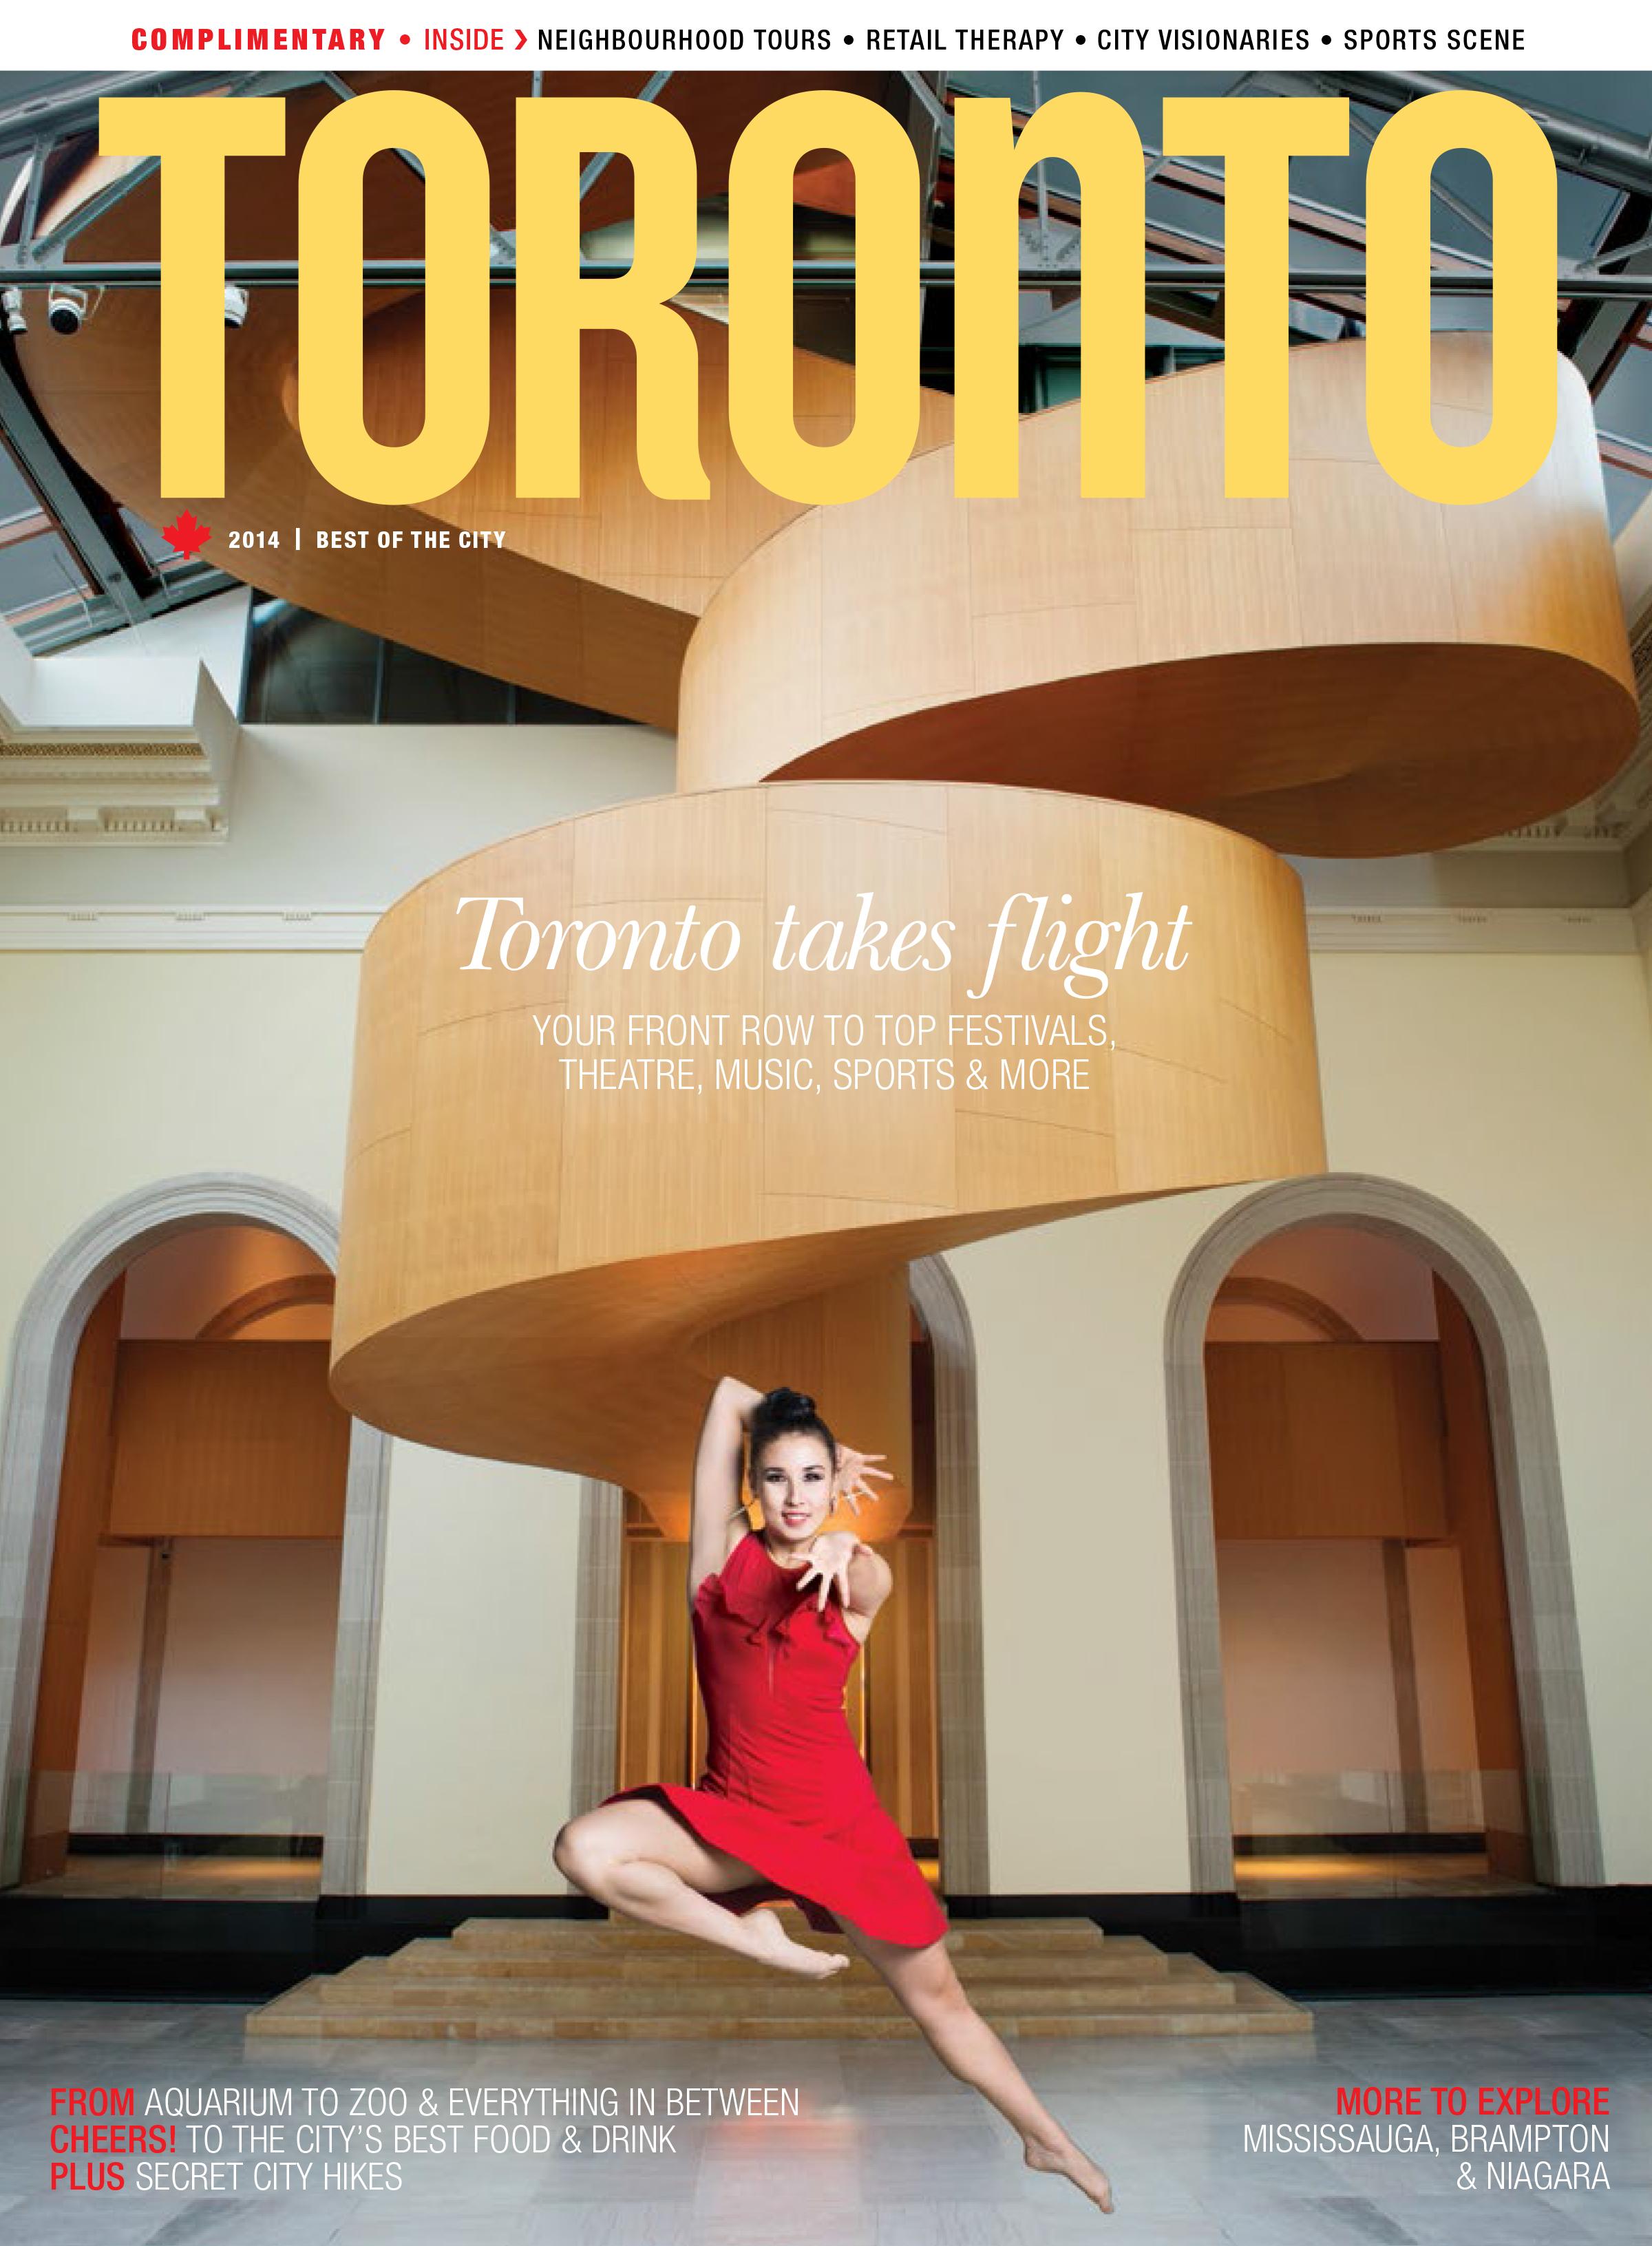 Toronto Magazine 2014 Highlights City's World-class Live